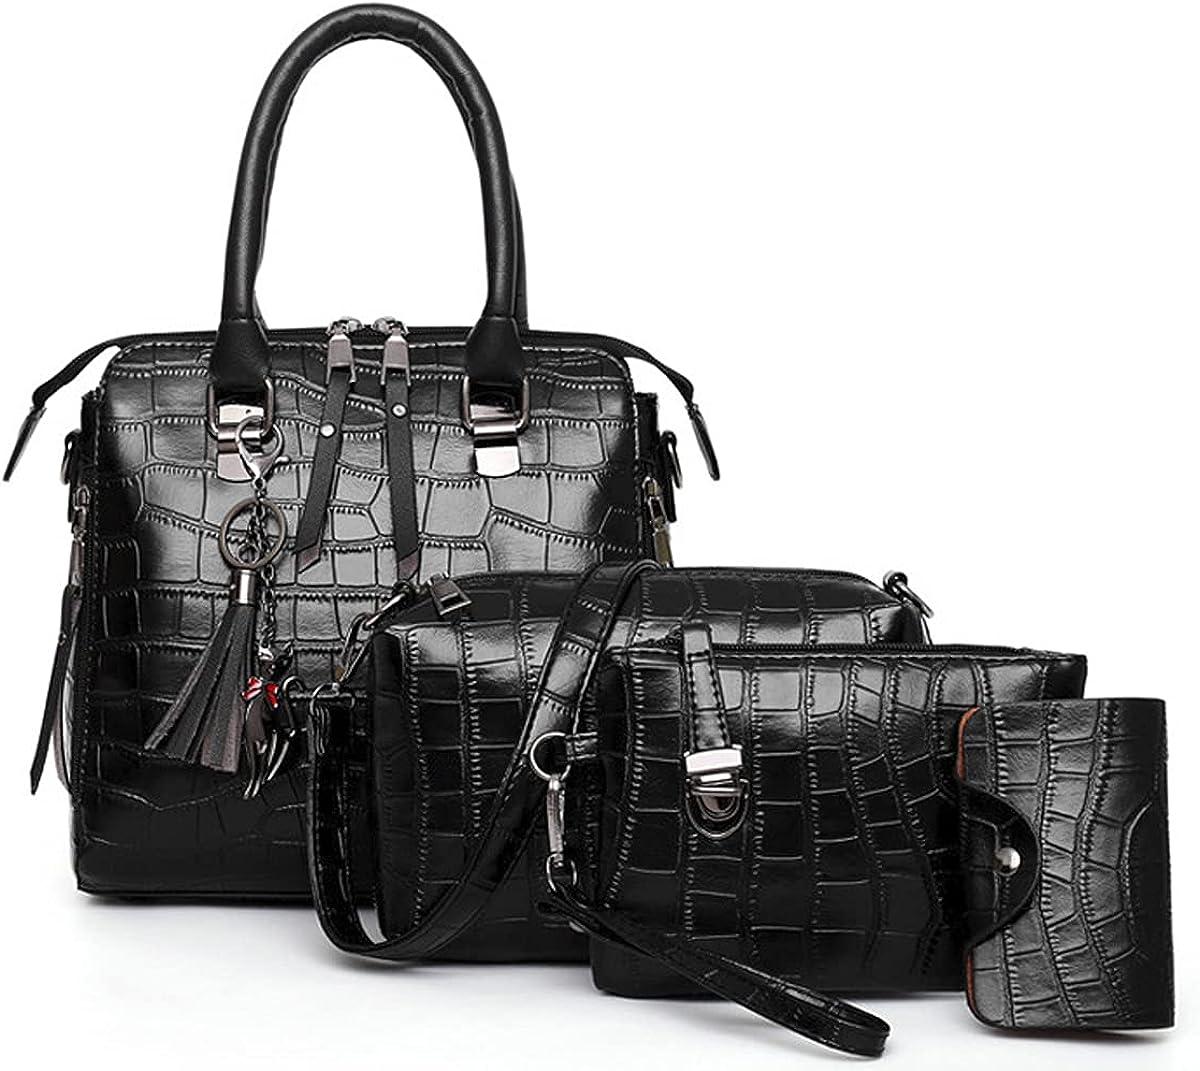 Women Handbag PU Leather Top Handle Satchel Shoulder Bags Messenger Tote Bag for Ladies 4 Pcs Set-Black